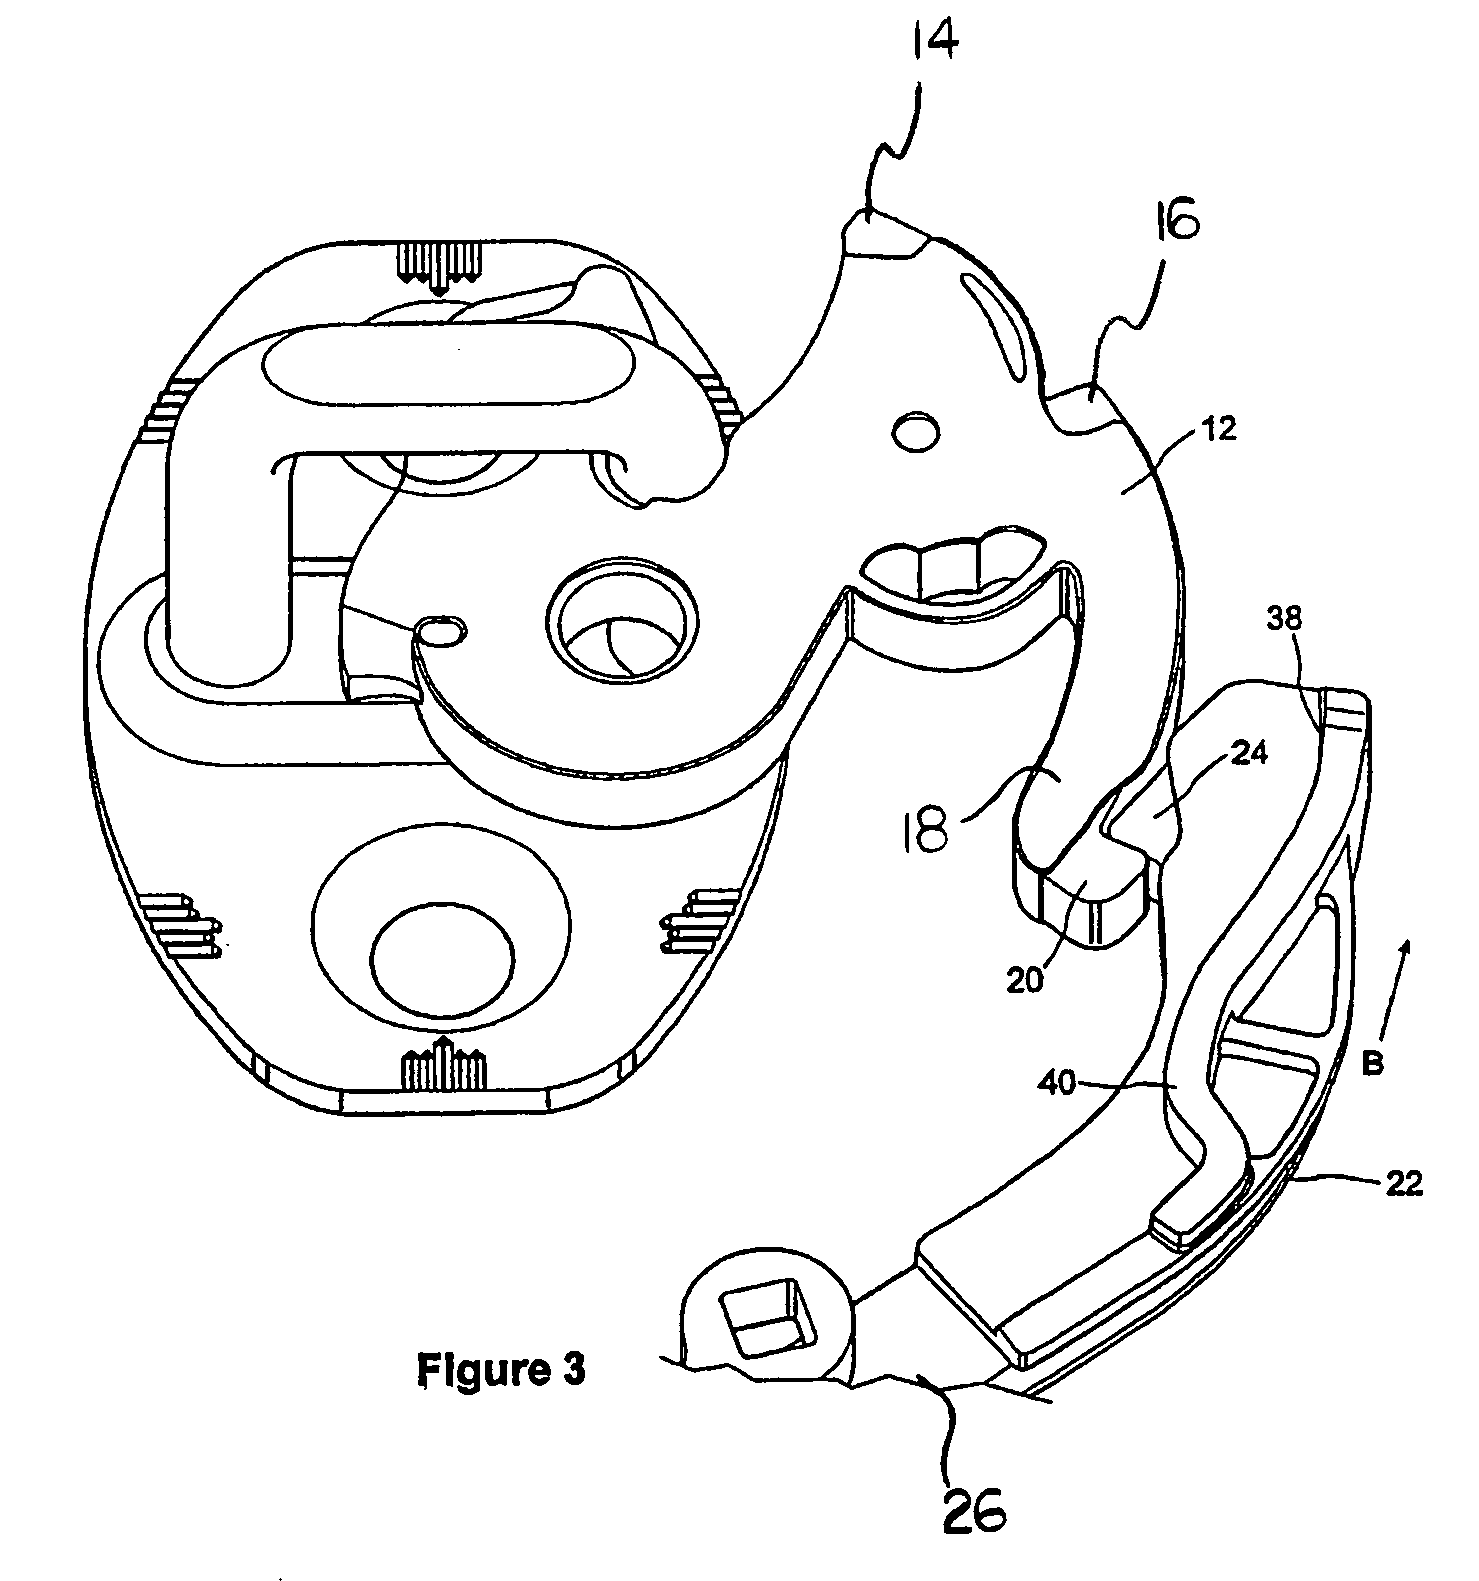 patent us7175212 latch having releasable cinching mechanism Automotive Windo Latch Door Latch patent drawing